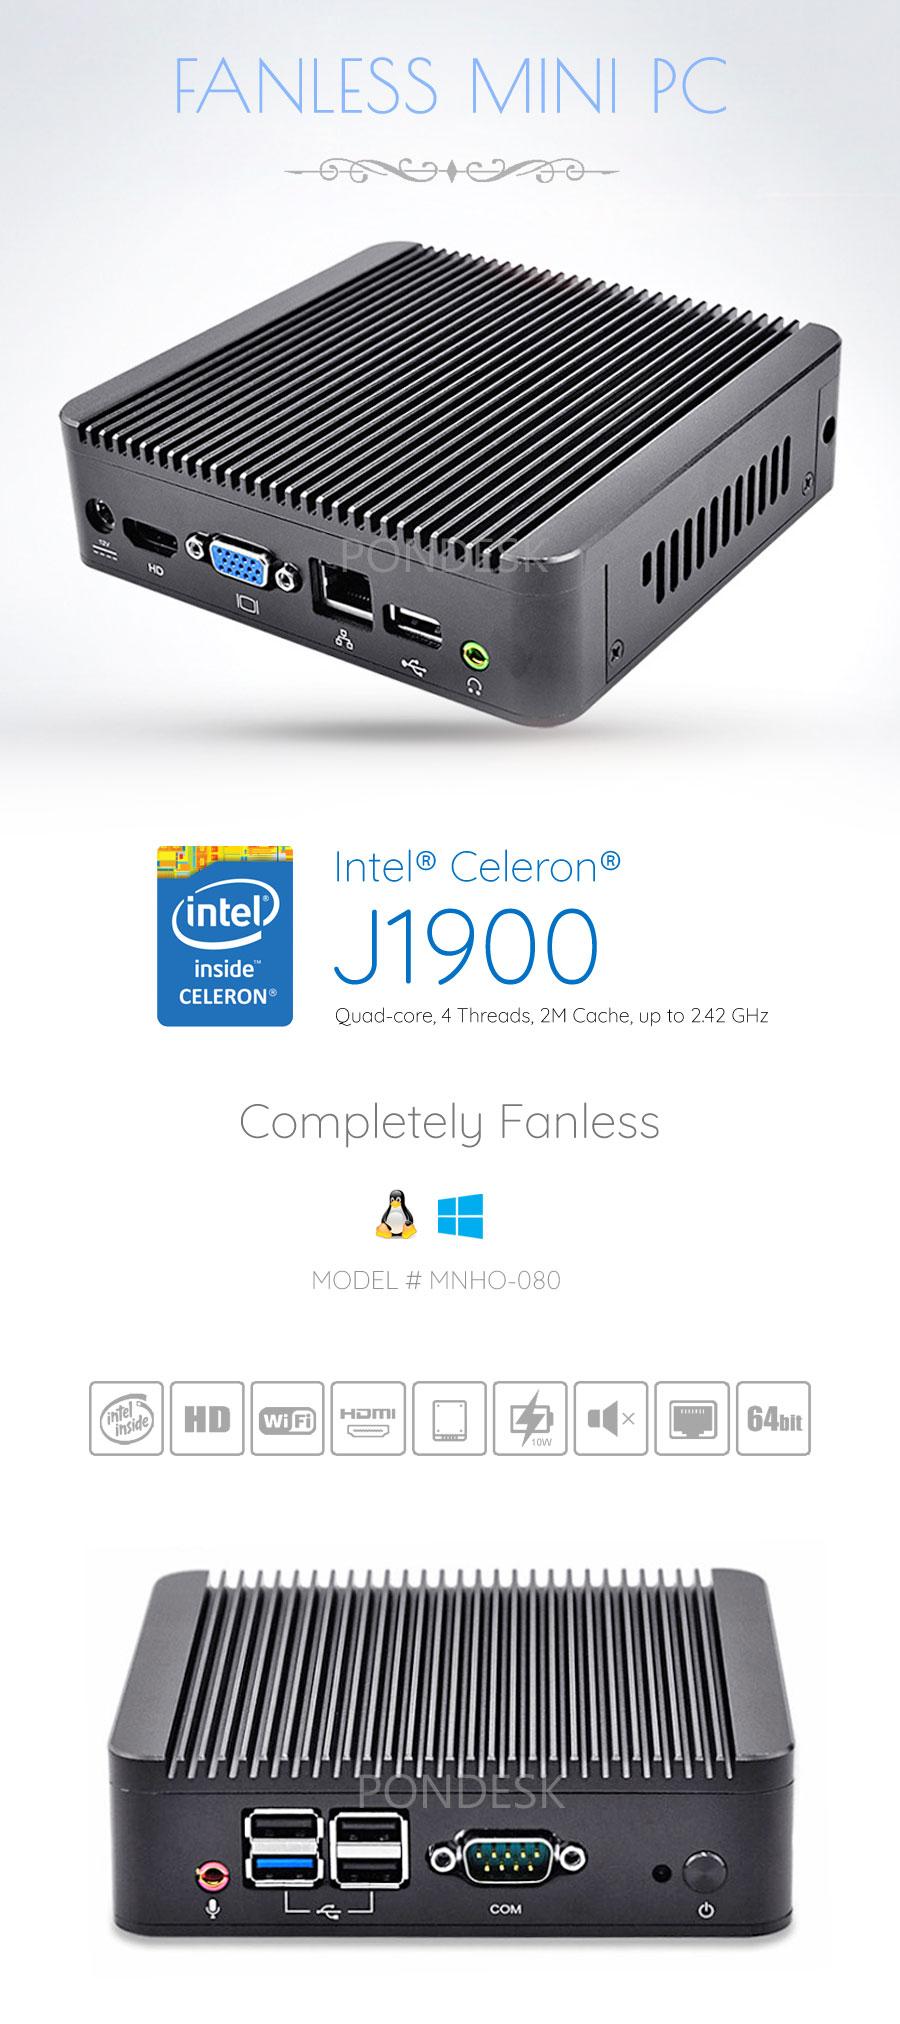 Intel® J1900 Quad Core HD Dual Display RS232 Fanless Mini PC - MNHO-080 | Image